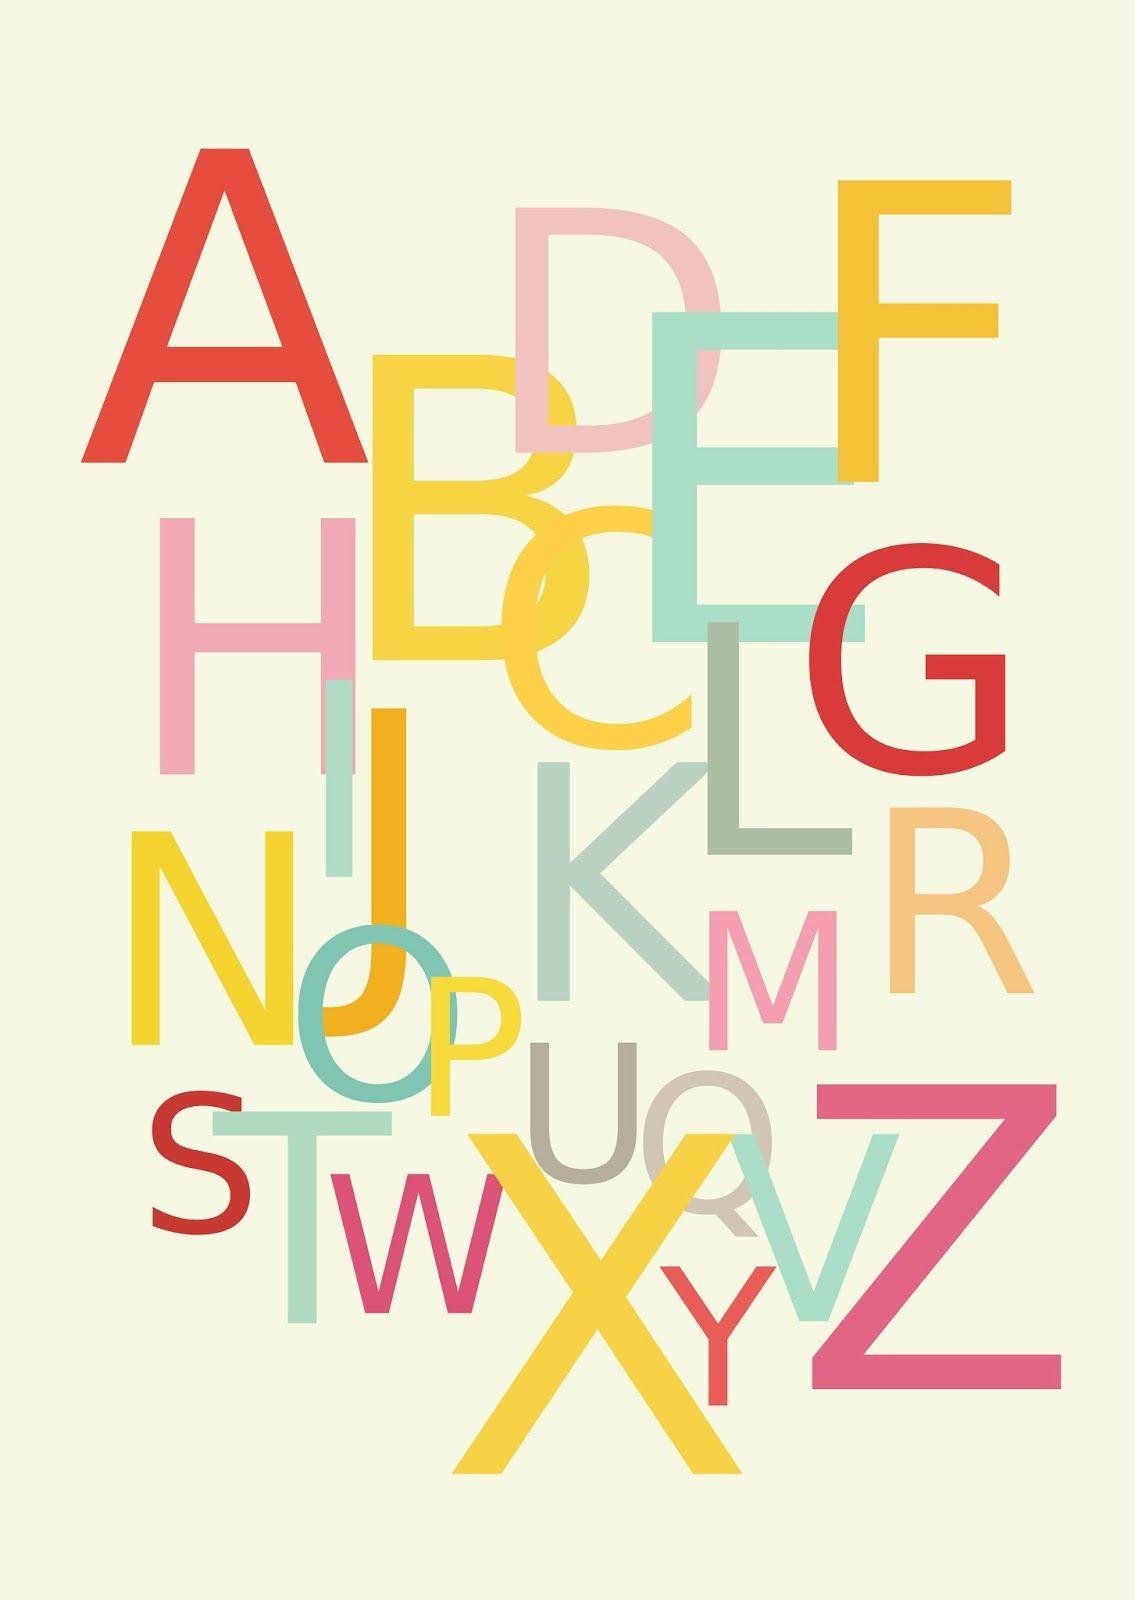 Alphabet Wall Art - talentneeds.com -